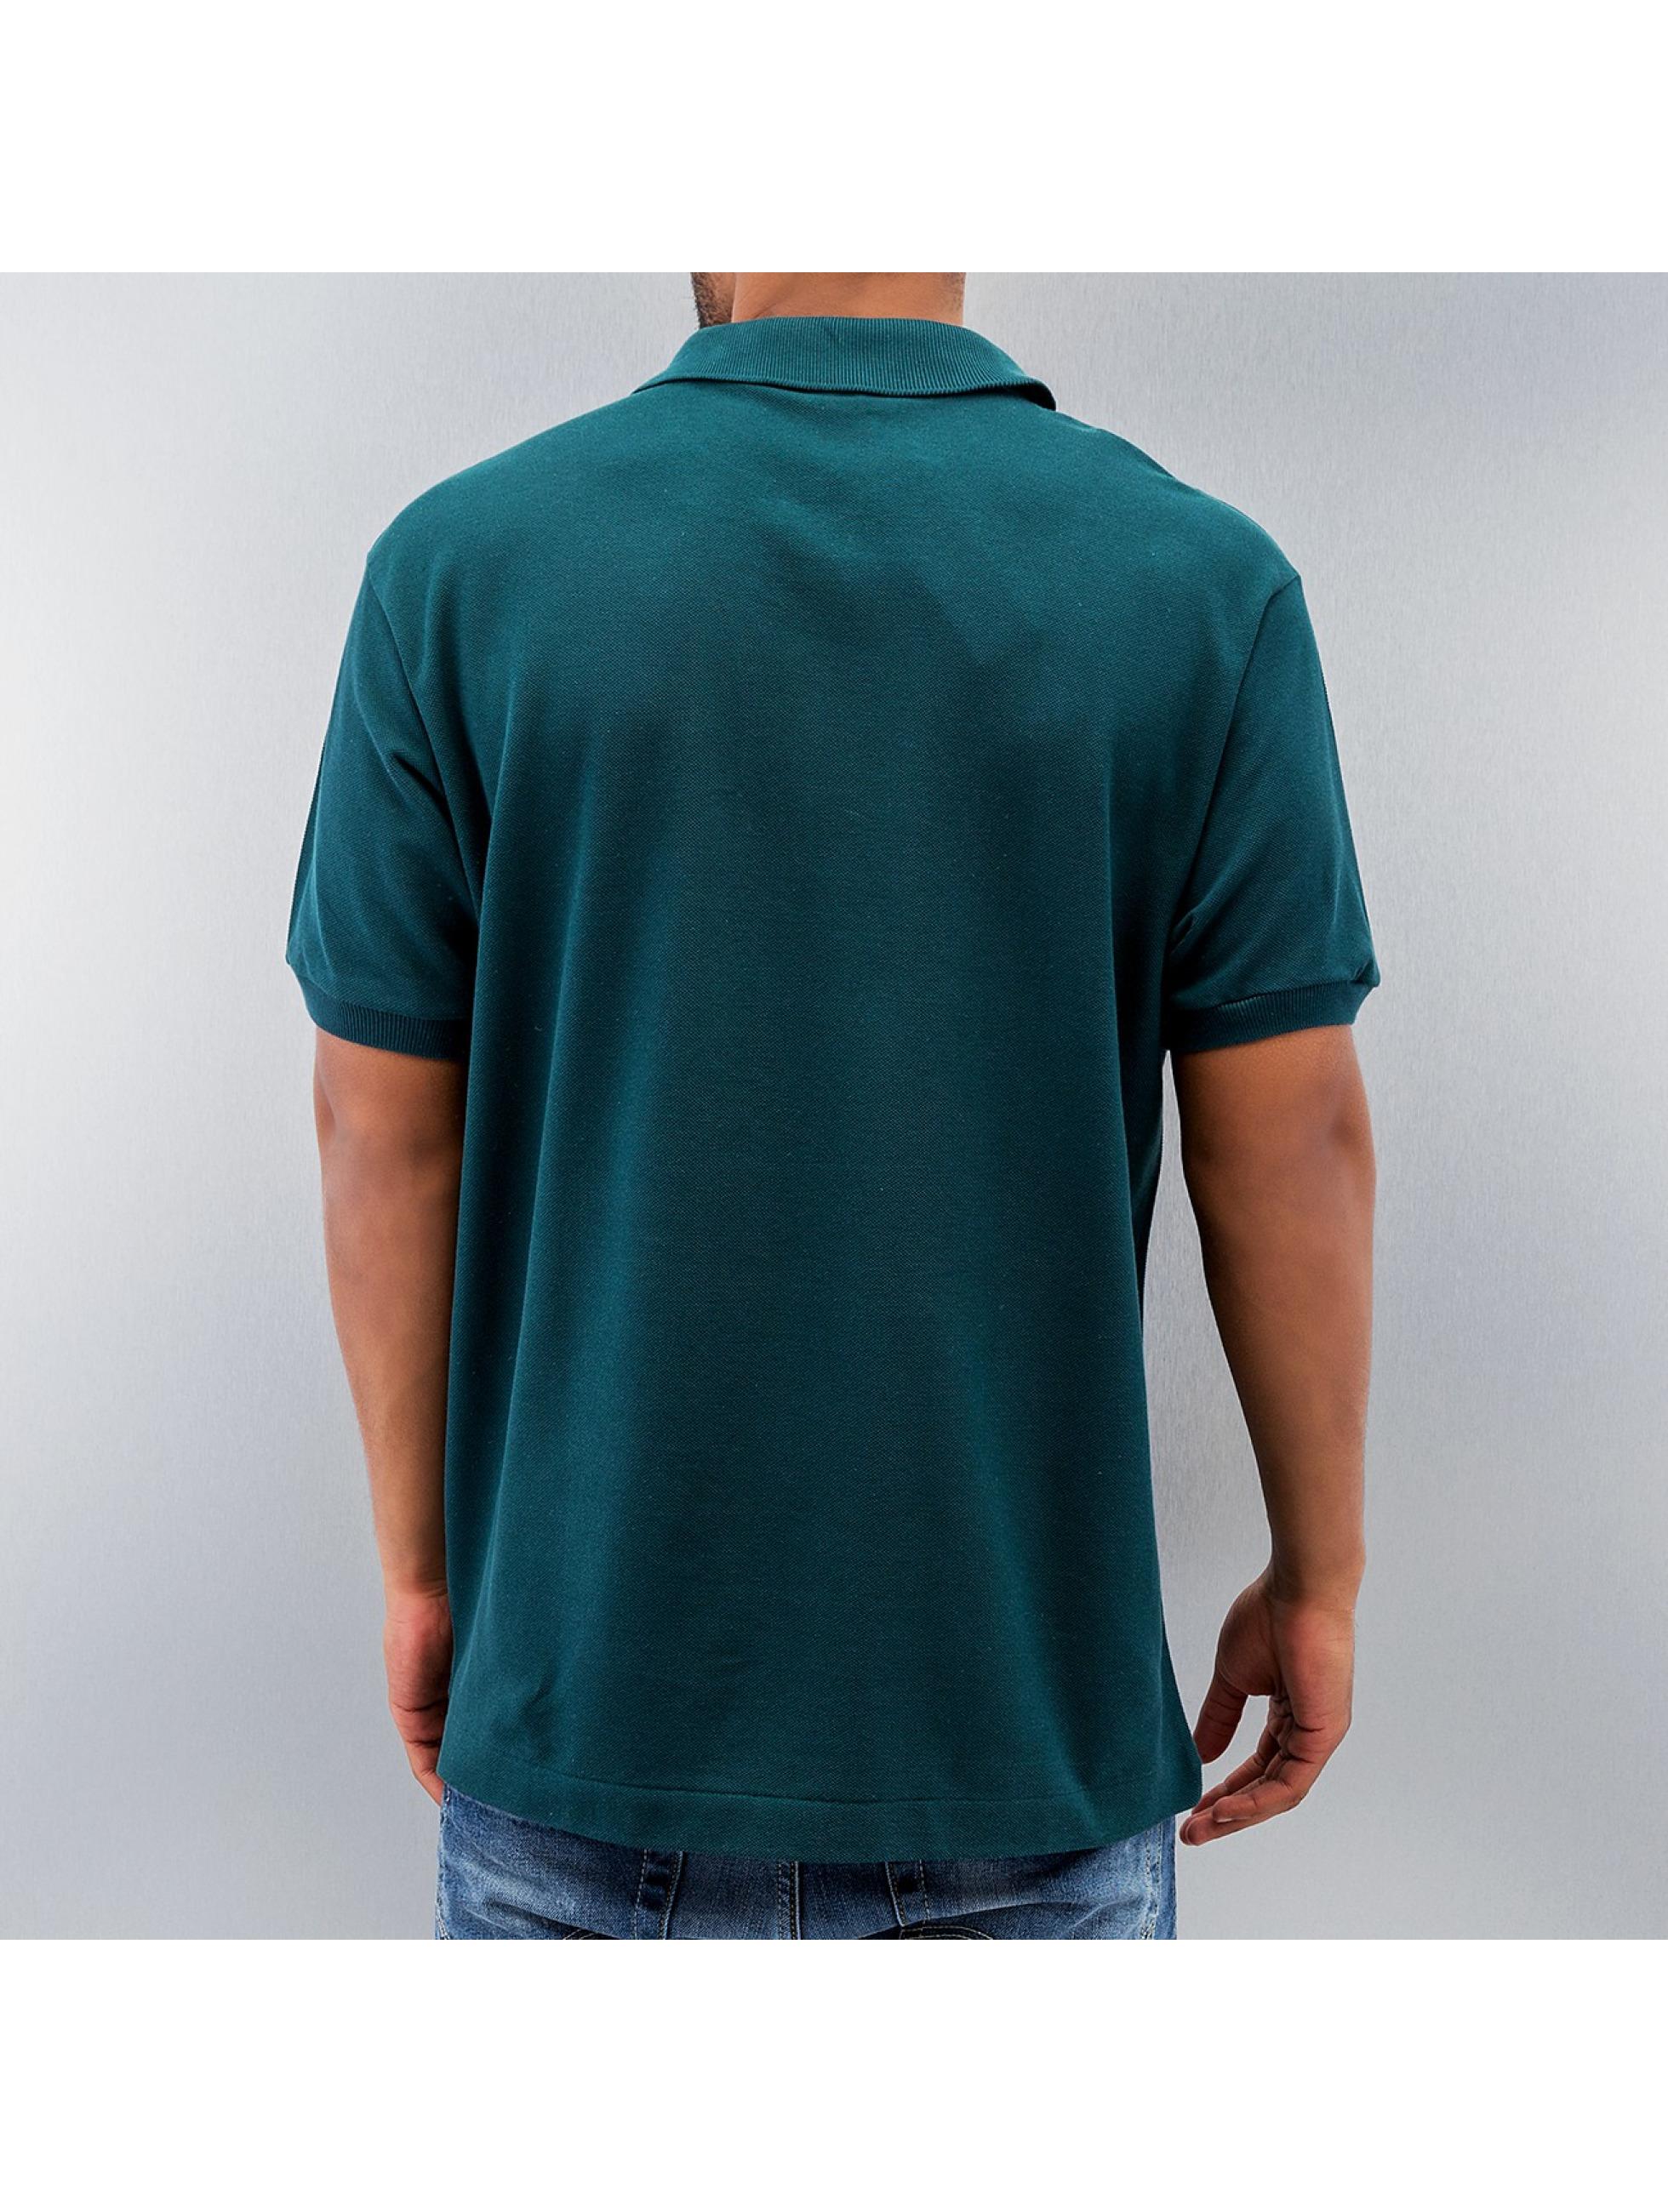 Lacoste poloshirt Basic groen